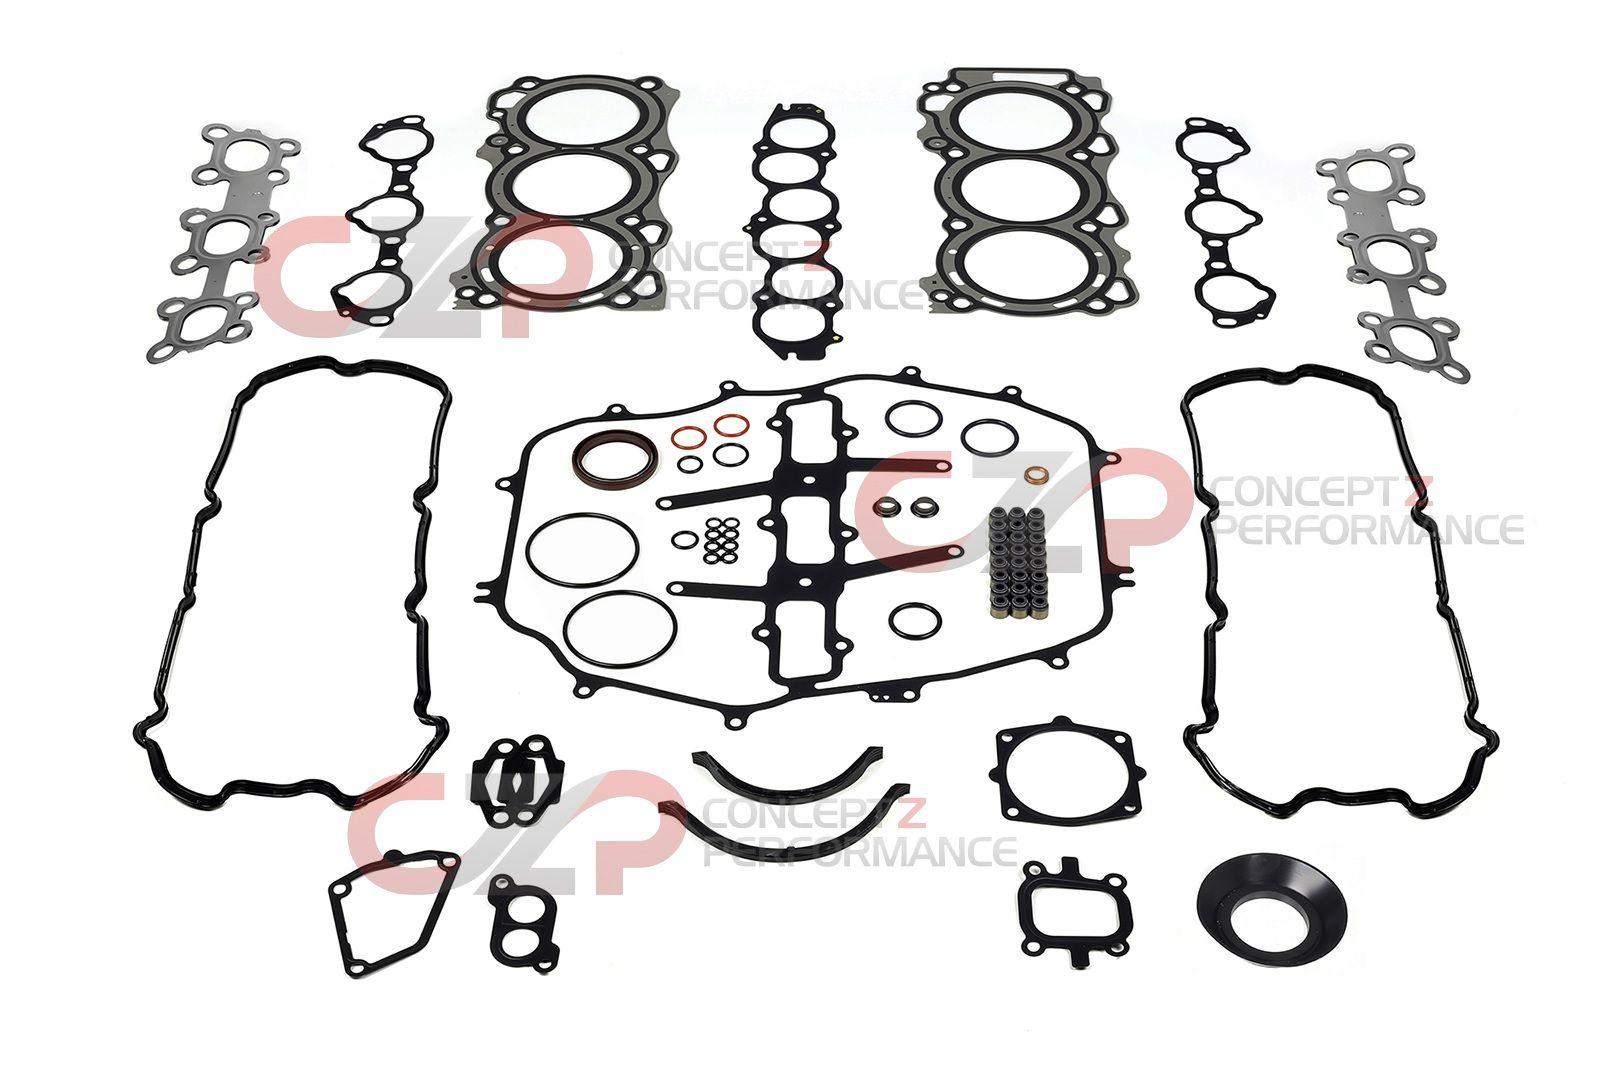 Ishino Stone OEM Engine Rebuild Gasket Kit, VQ35DE - Nissan 350Z / Infiniti  G35 JFS-00641 A0101-CD325 A0AMA-AC385 A0AMA-CD325 - Concept Z Performance